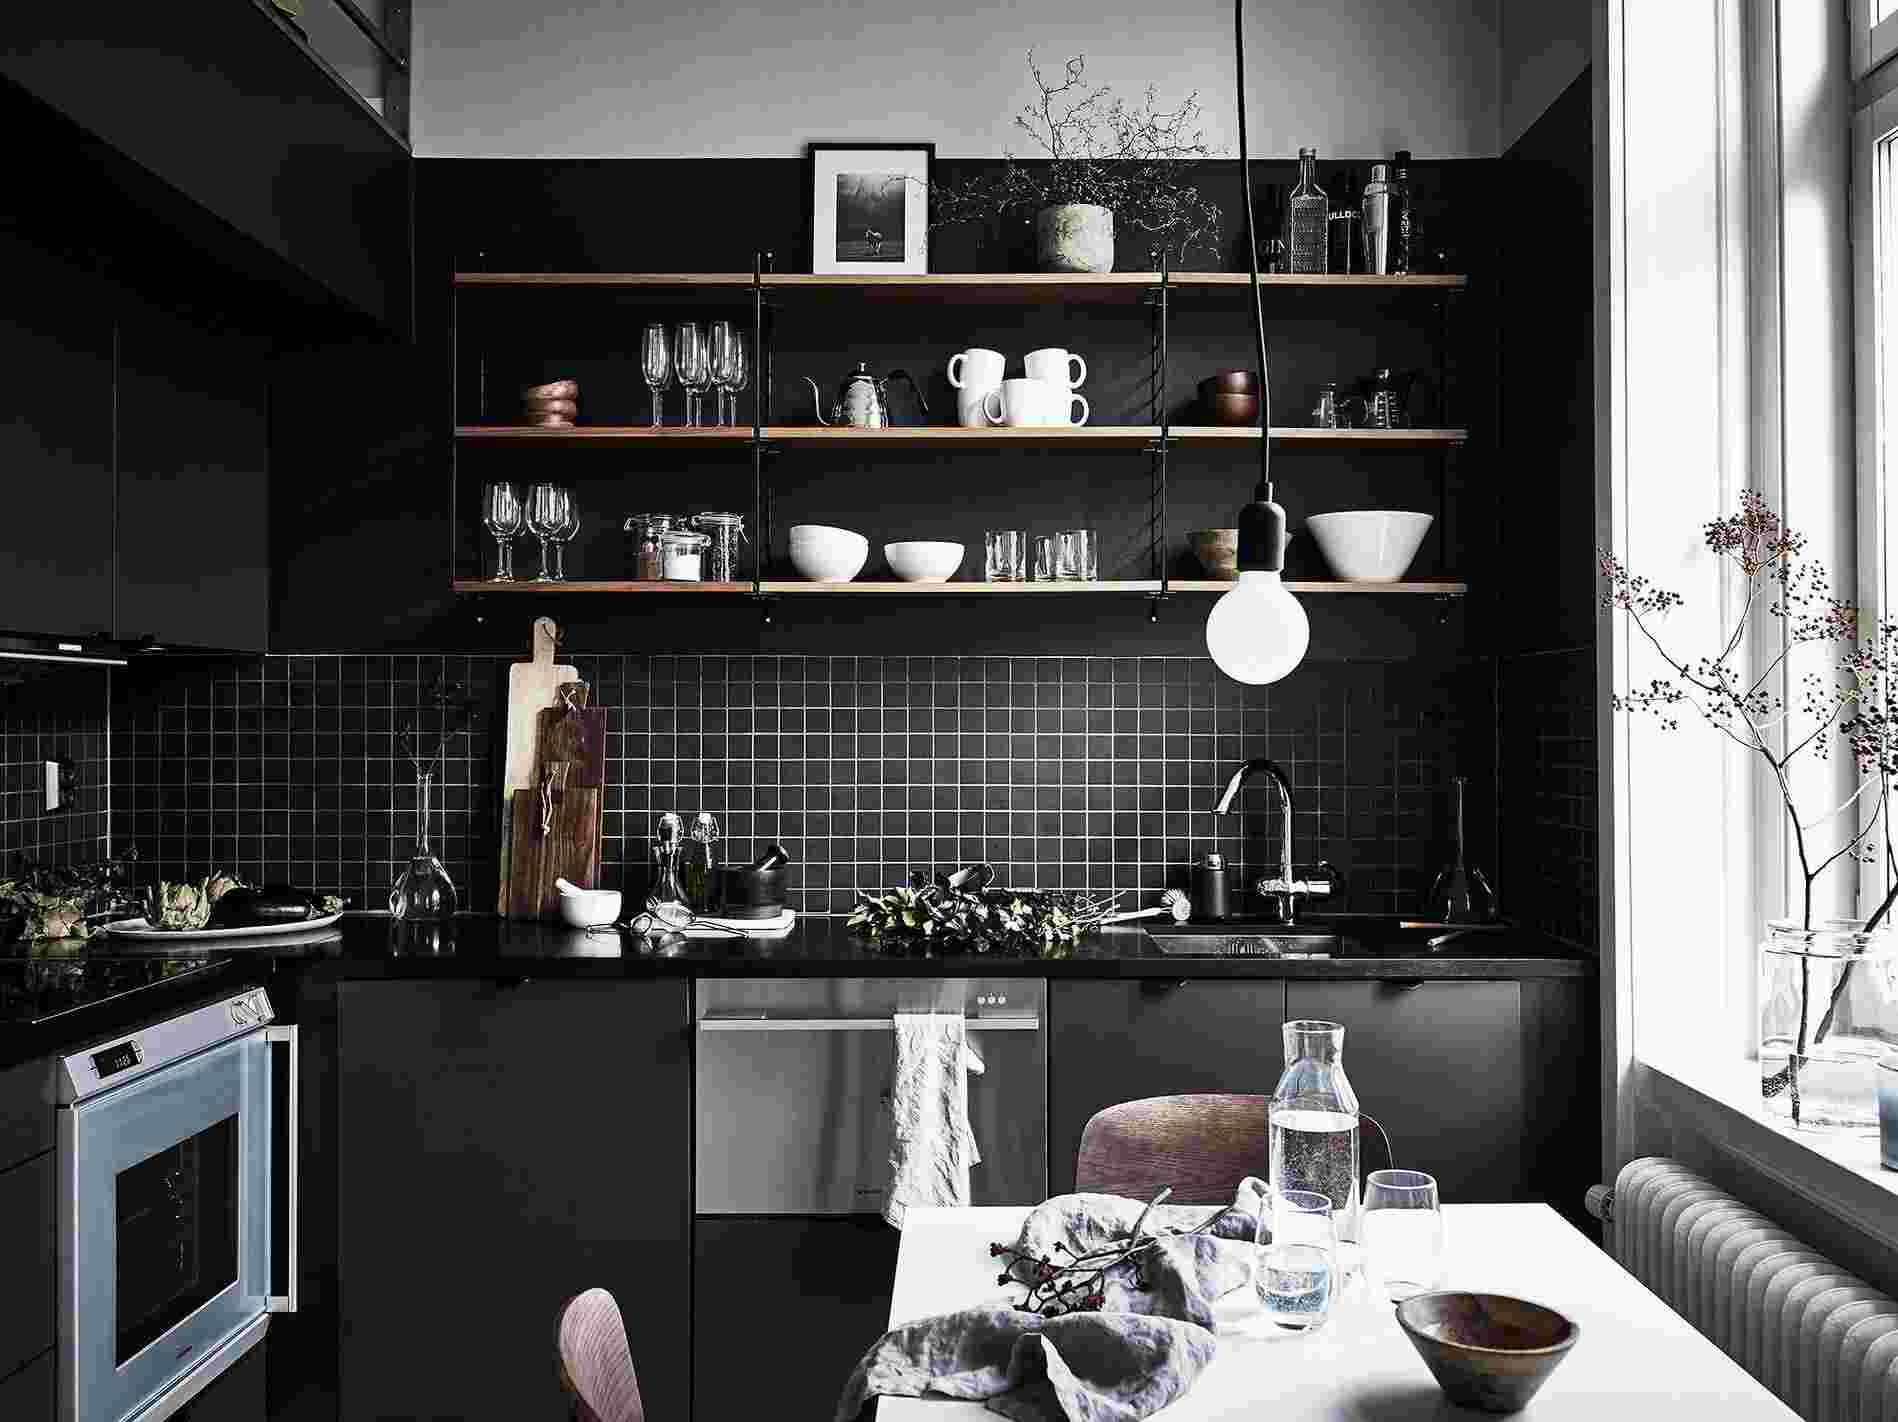 Cocinas negras sofisticadas elegantes y atrevidas for Decoracion de cocinas pequenas 2016